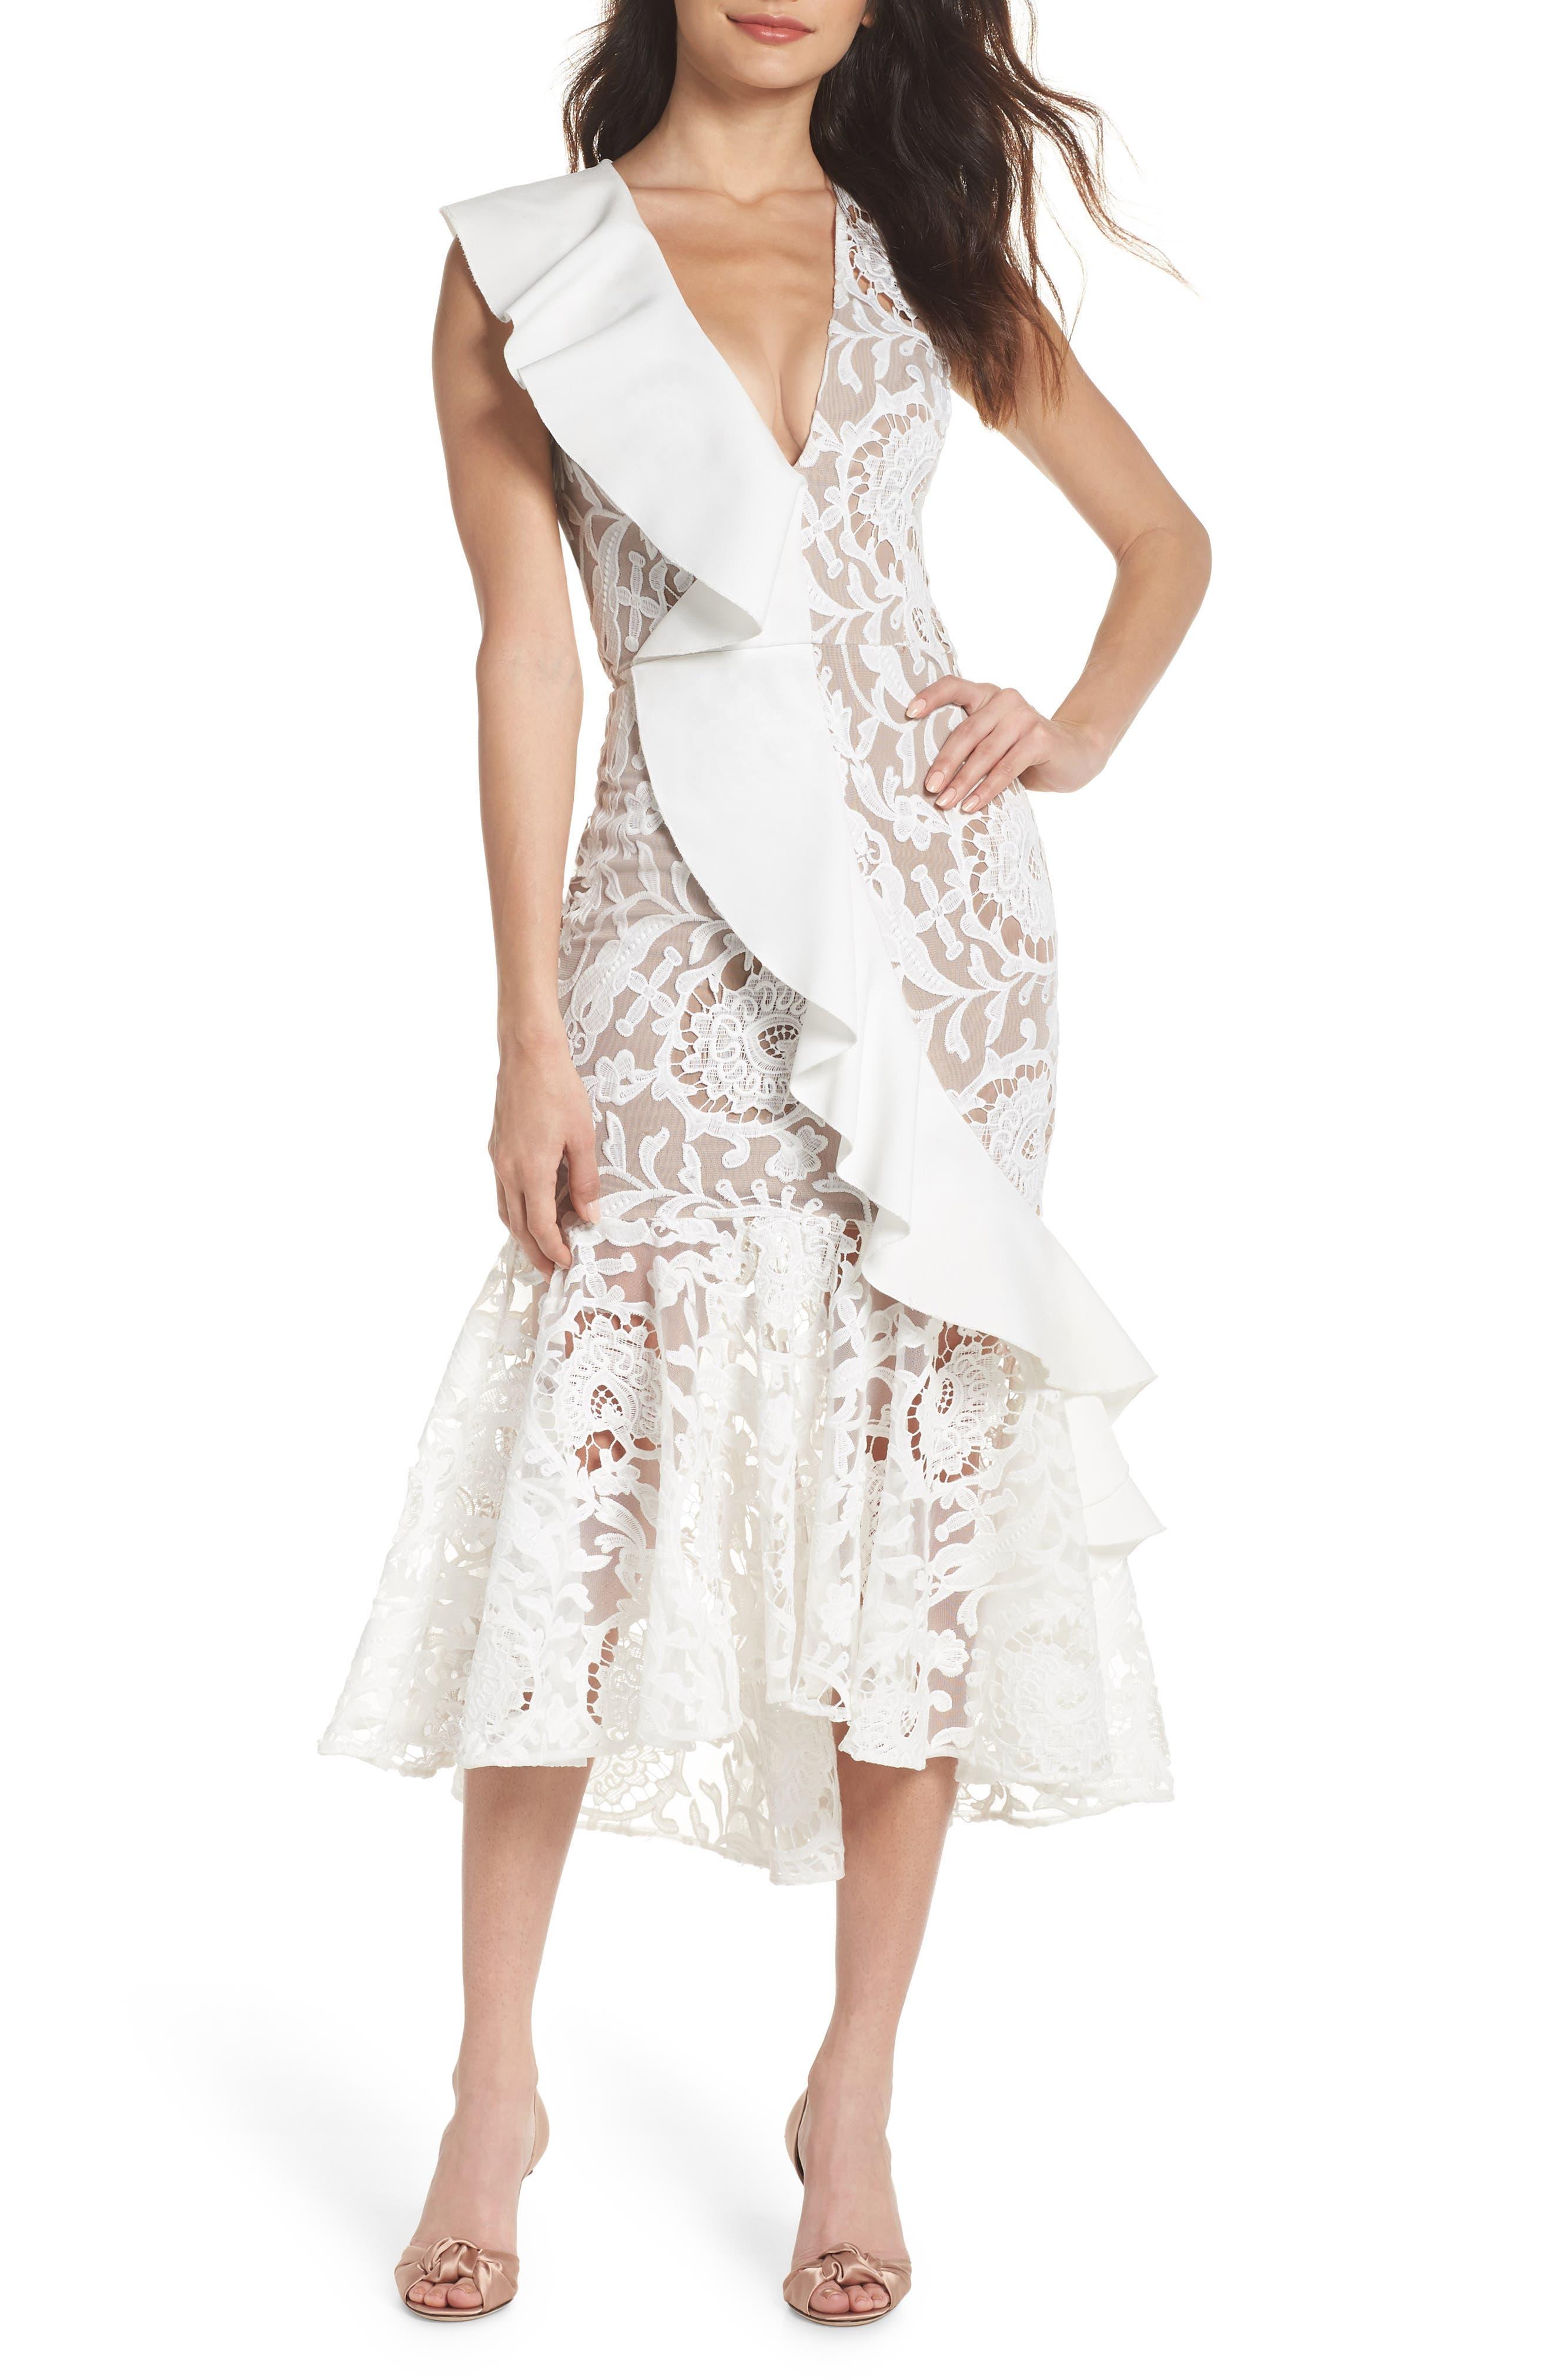 Rocha Waterfall Ruffle Lace Midi Dress,                             Main thumbnail 1, color,                             White